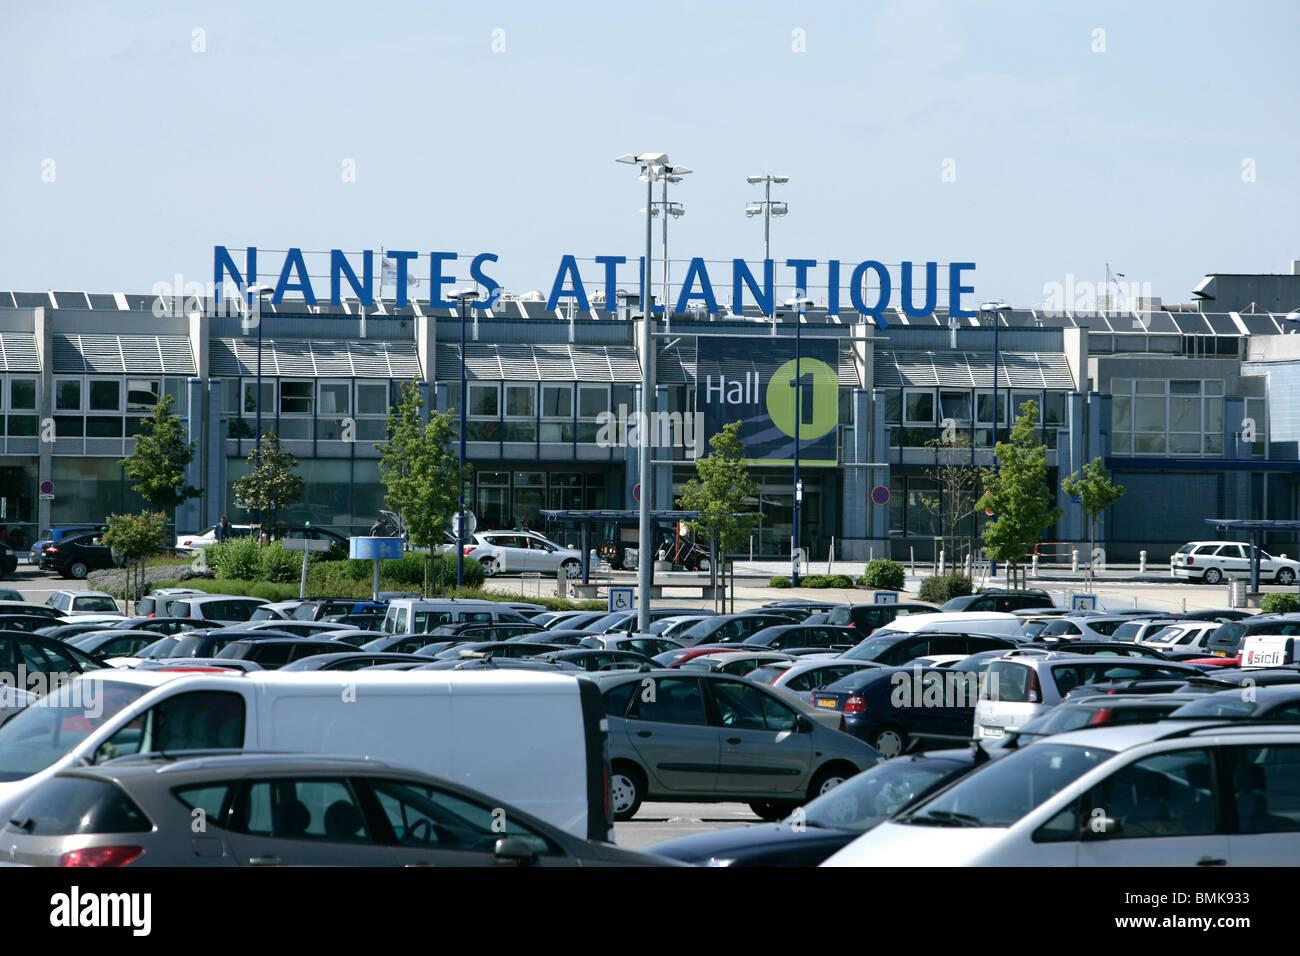 Nantes Atlantique Airport - Stock Image